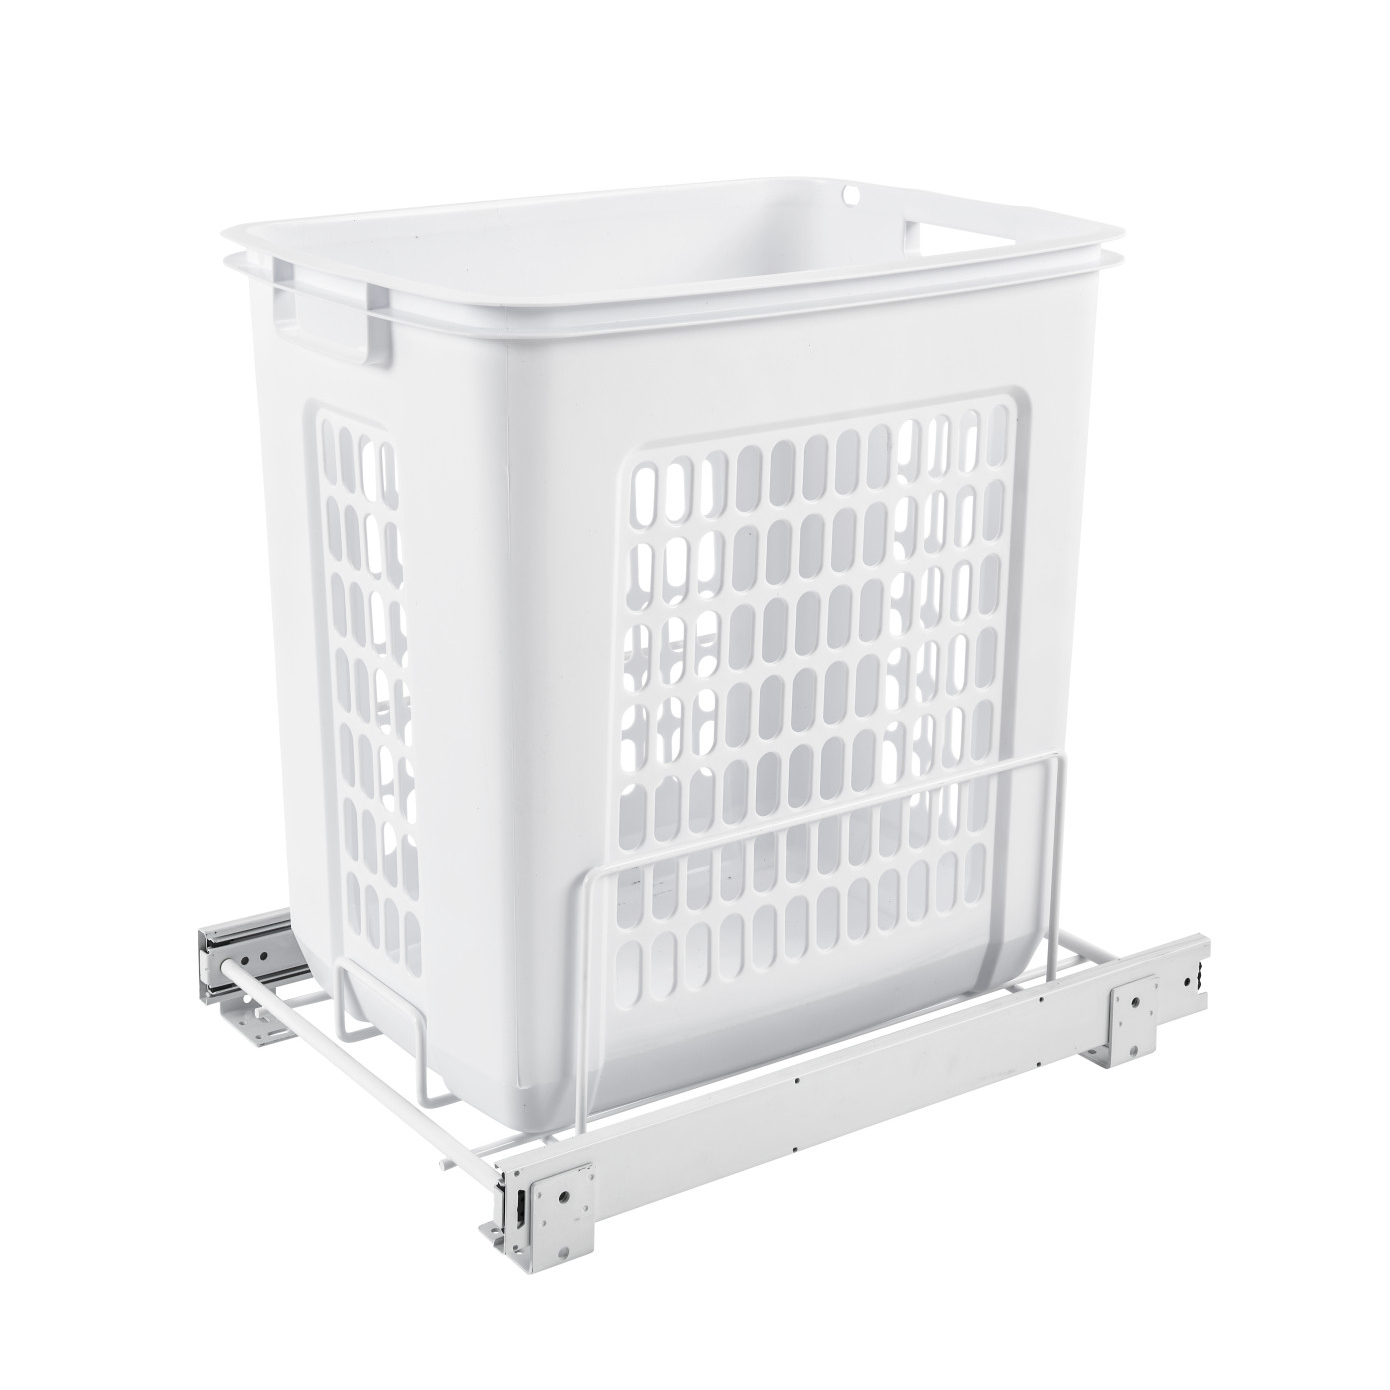 Rev A Shelf Hprv 15020 S Large 20 Inch Pullout Polymer Clothes Hamper White 90713029016 Ebay